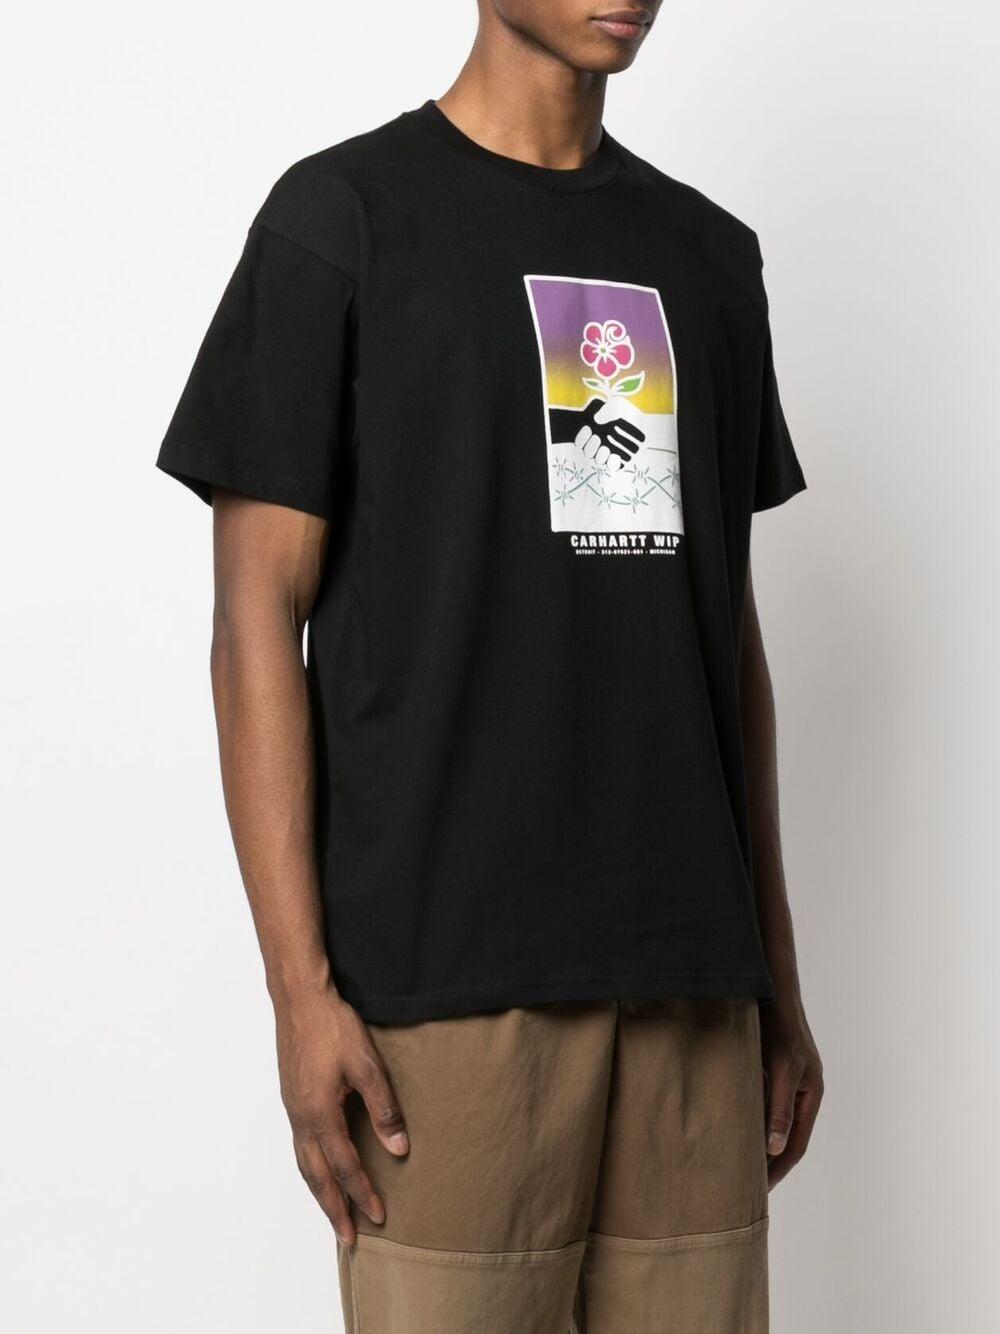 Carhartt wip t-shirt con stampa uomo CARHARTT WIP   T-shirt   I02901689.00